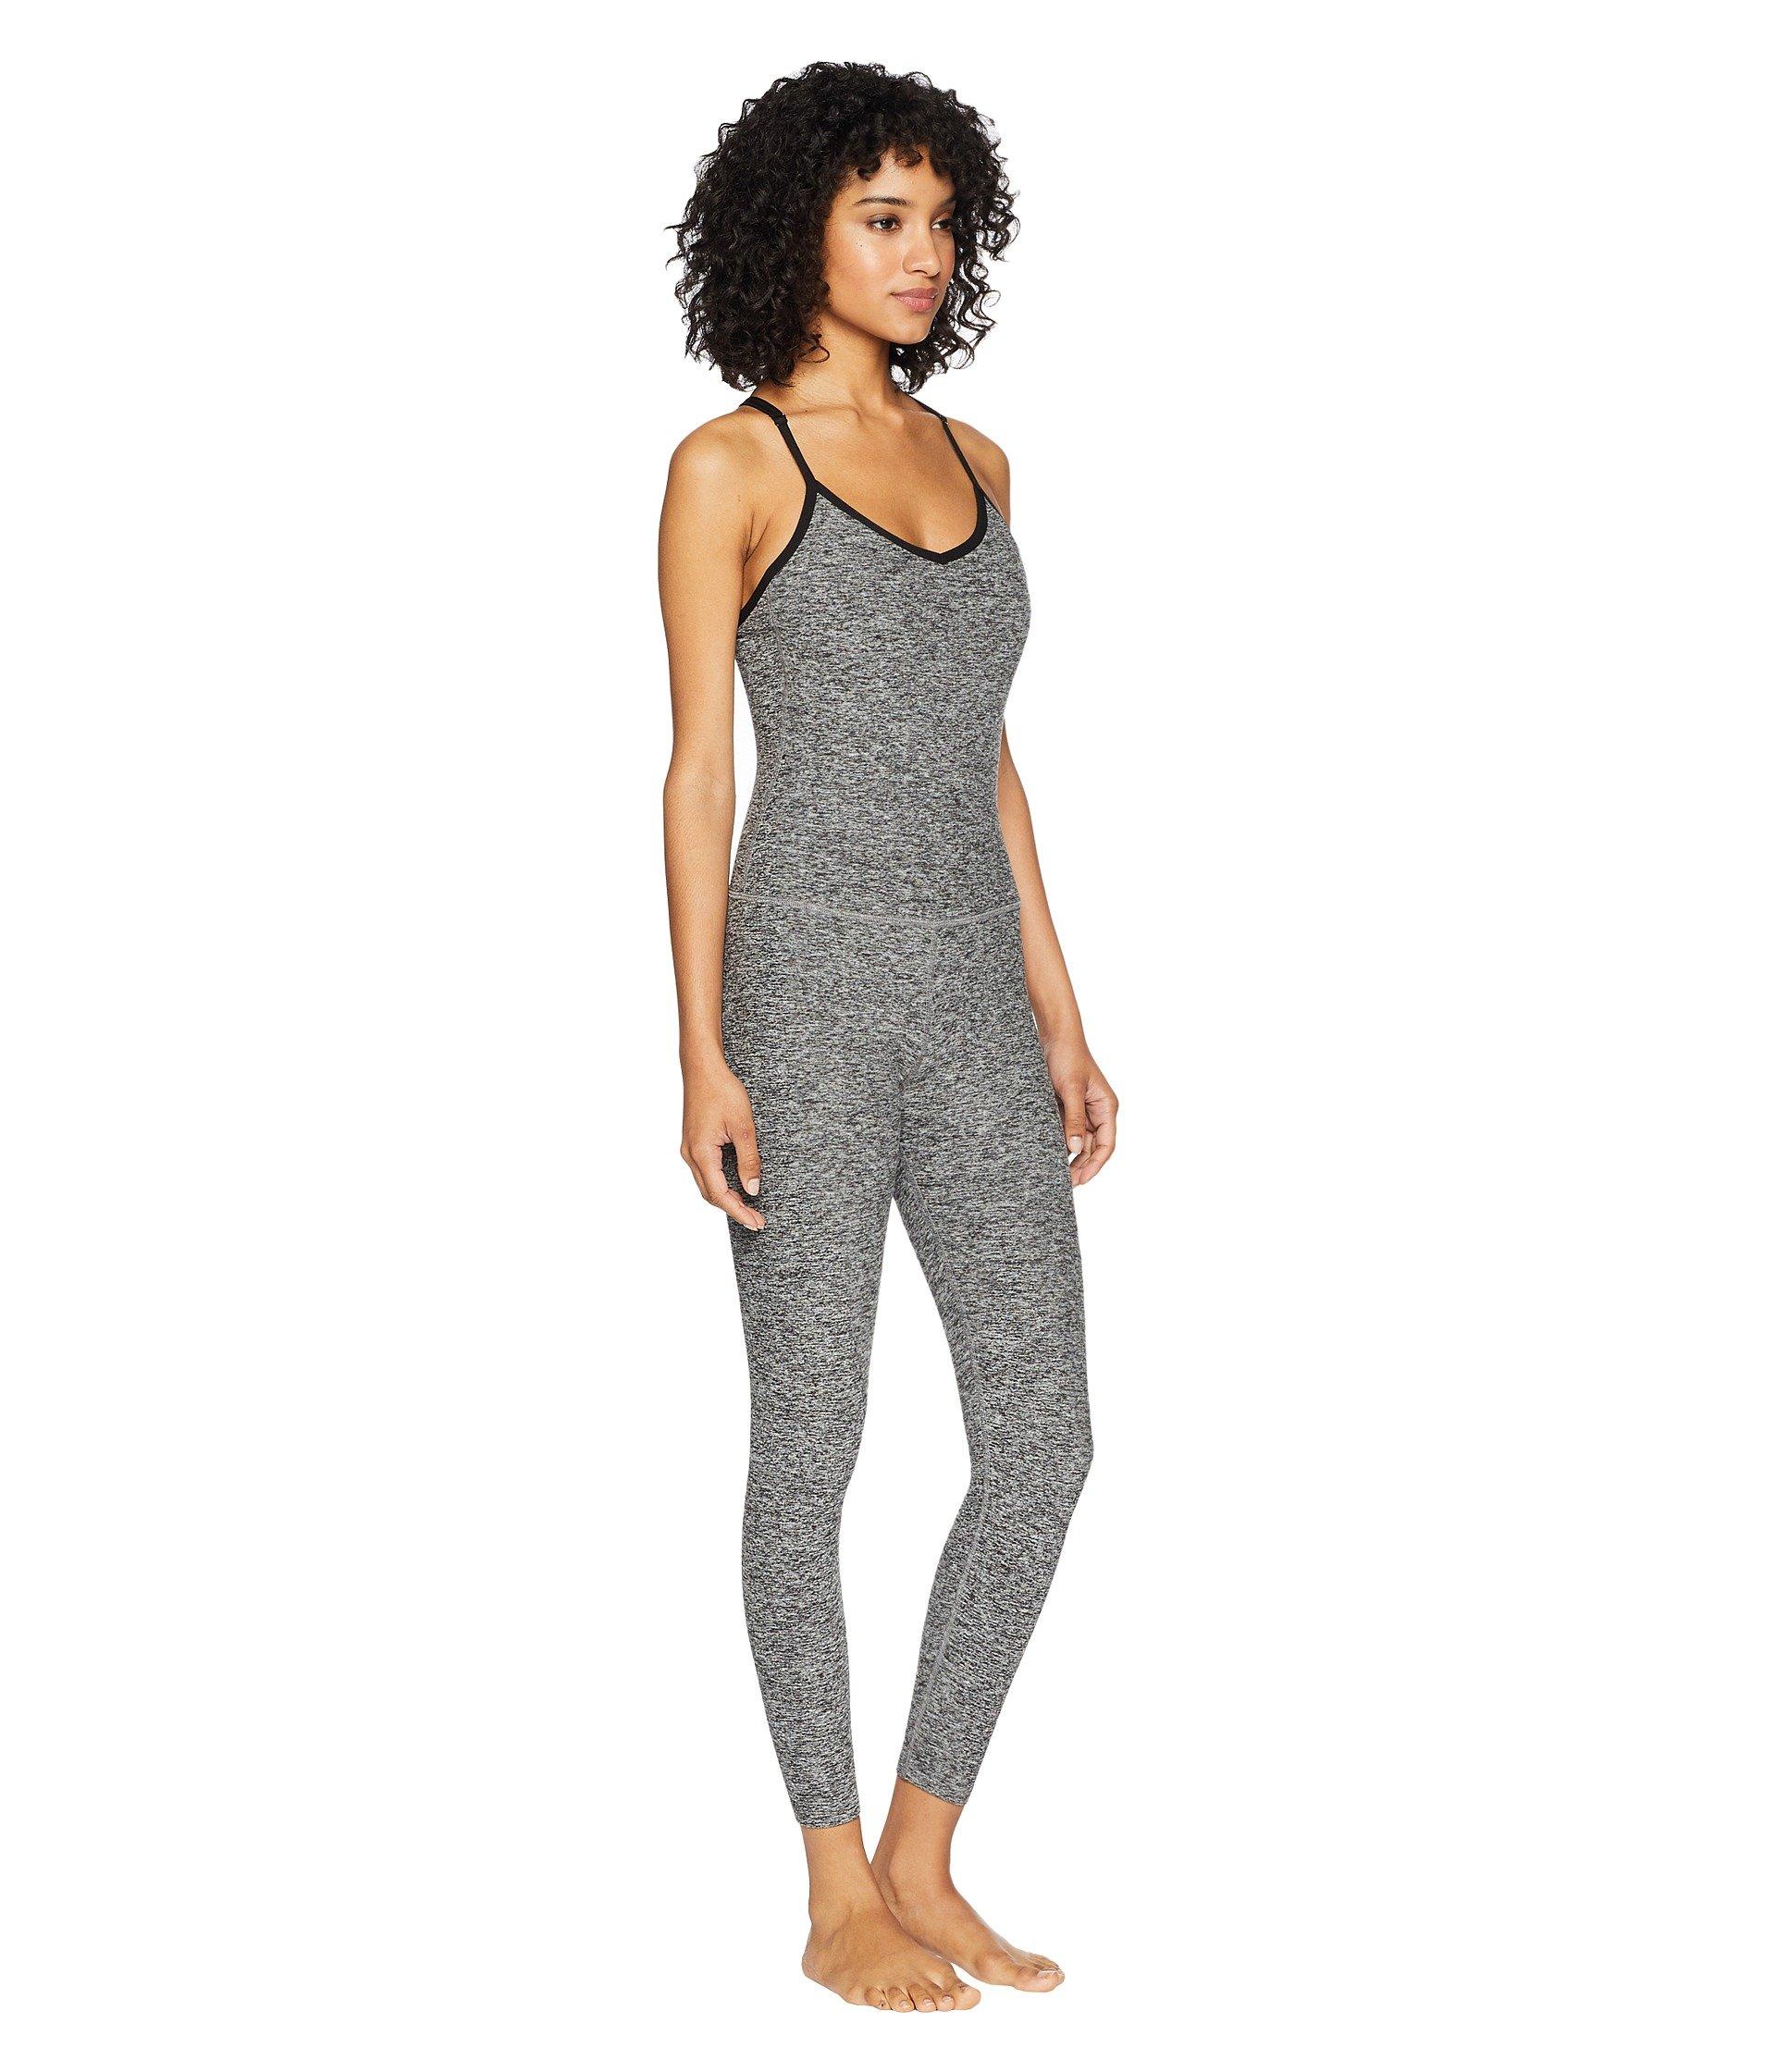 Yoga Black Spacedye Bodysuit Capris white Elevation Beyond 1xHgdUqH